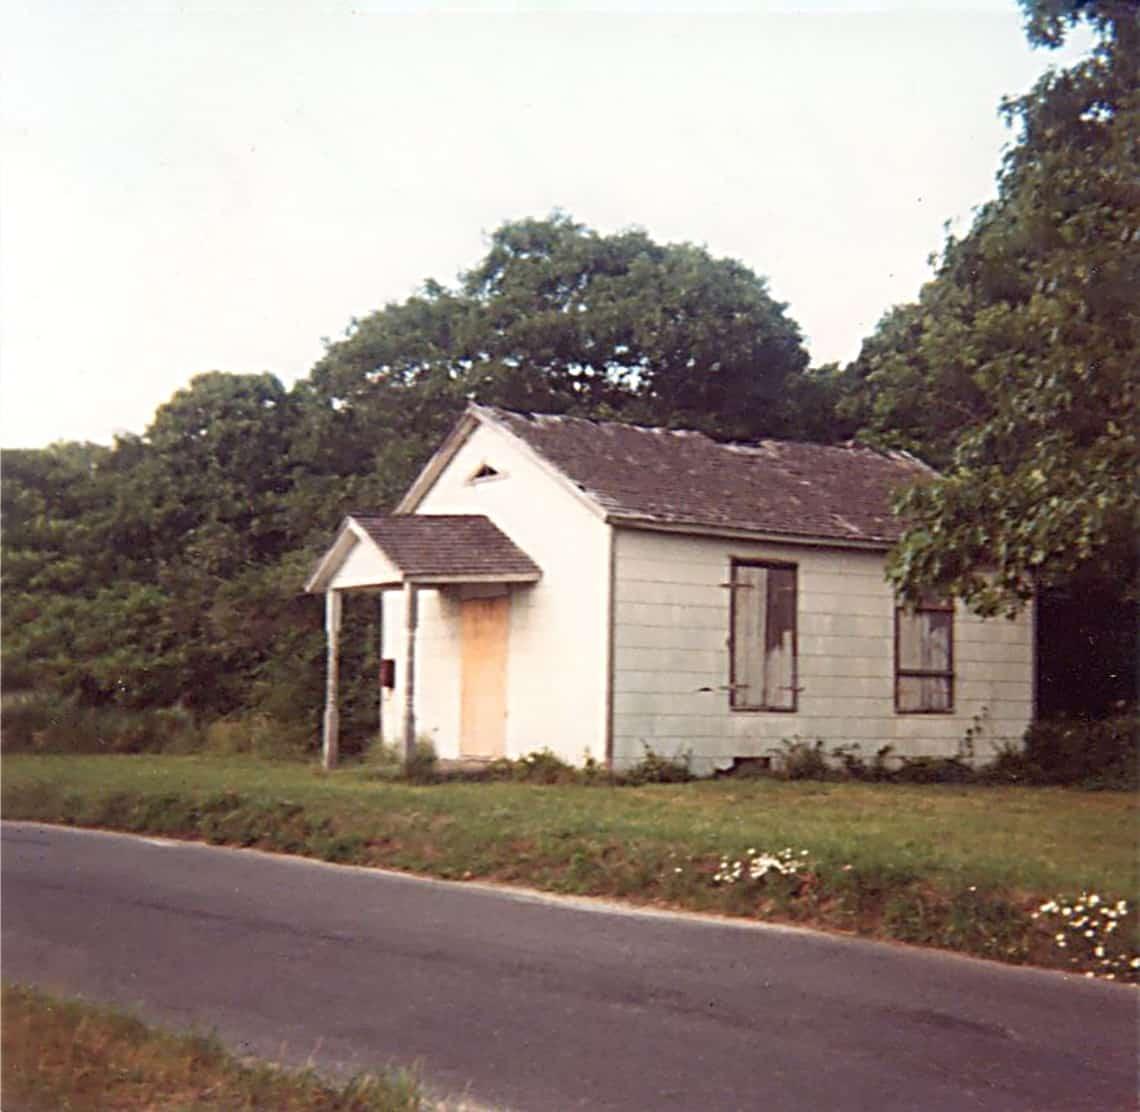 Little-Church-david-martine-1970-80 Little Church Jeremy Dennis On This Site